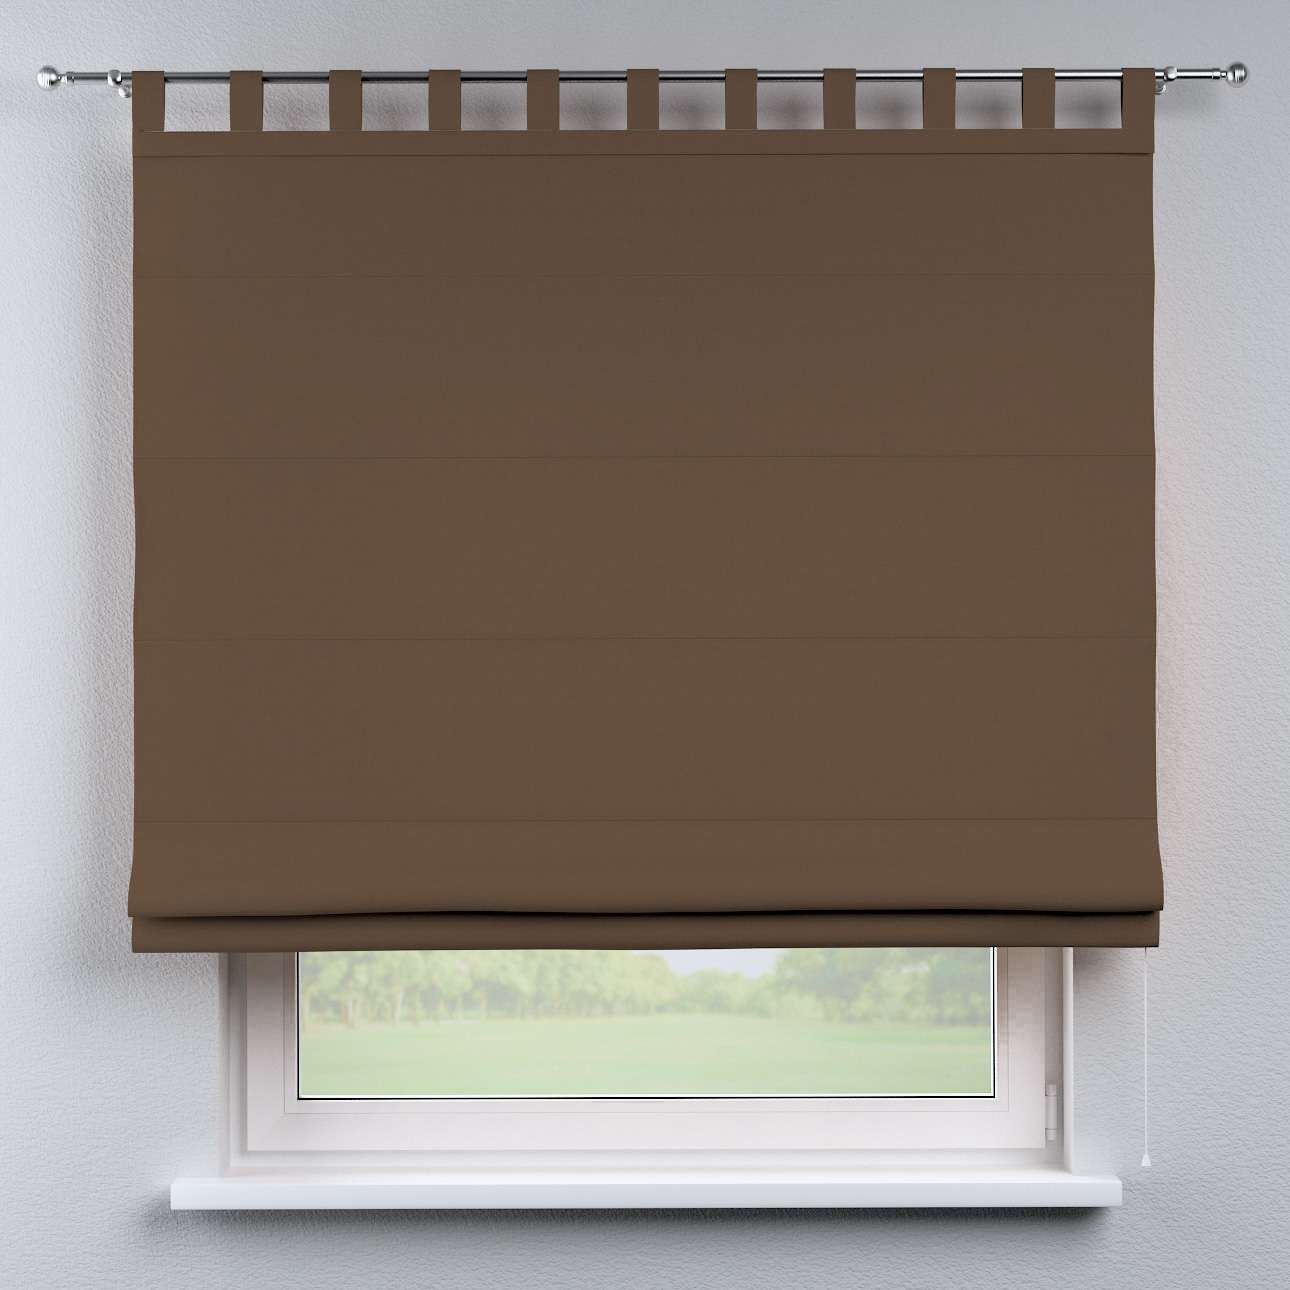 Verona raffrolók 80 x 170 cm a kollekcióból Bútorszövet Cotton Panama, Dekoranyag: 702-02